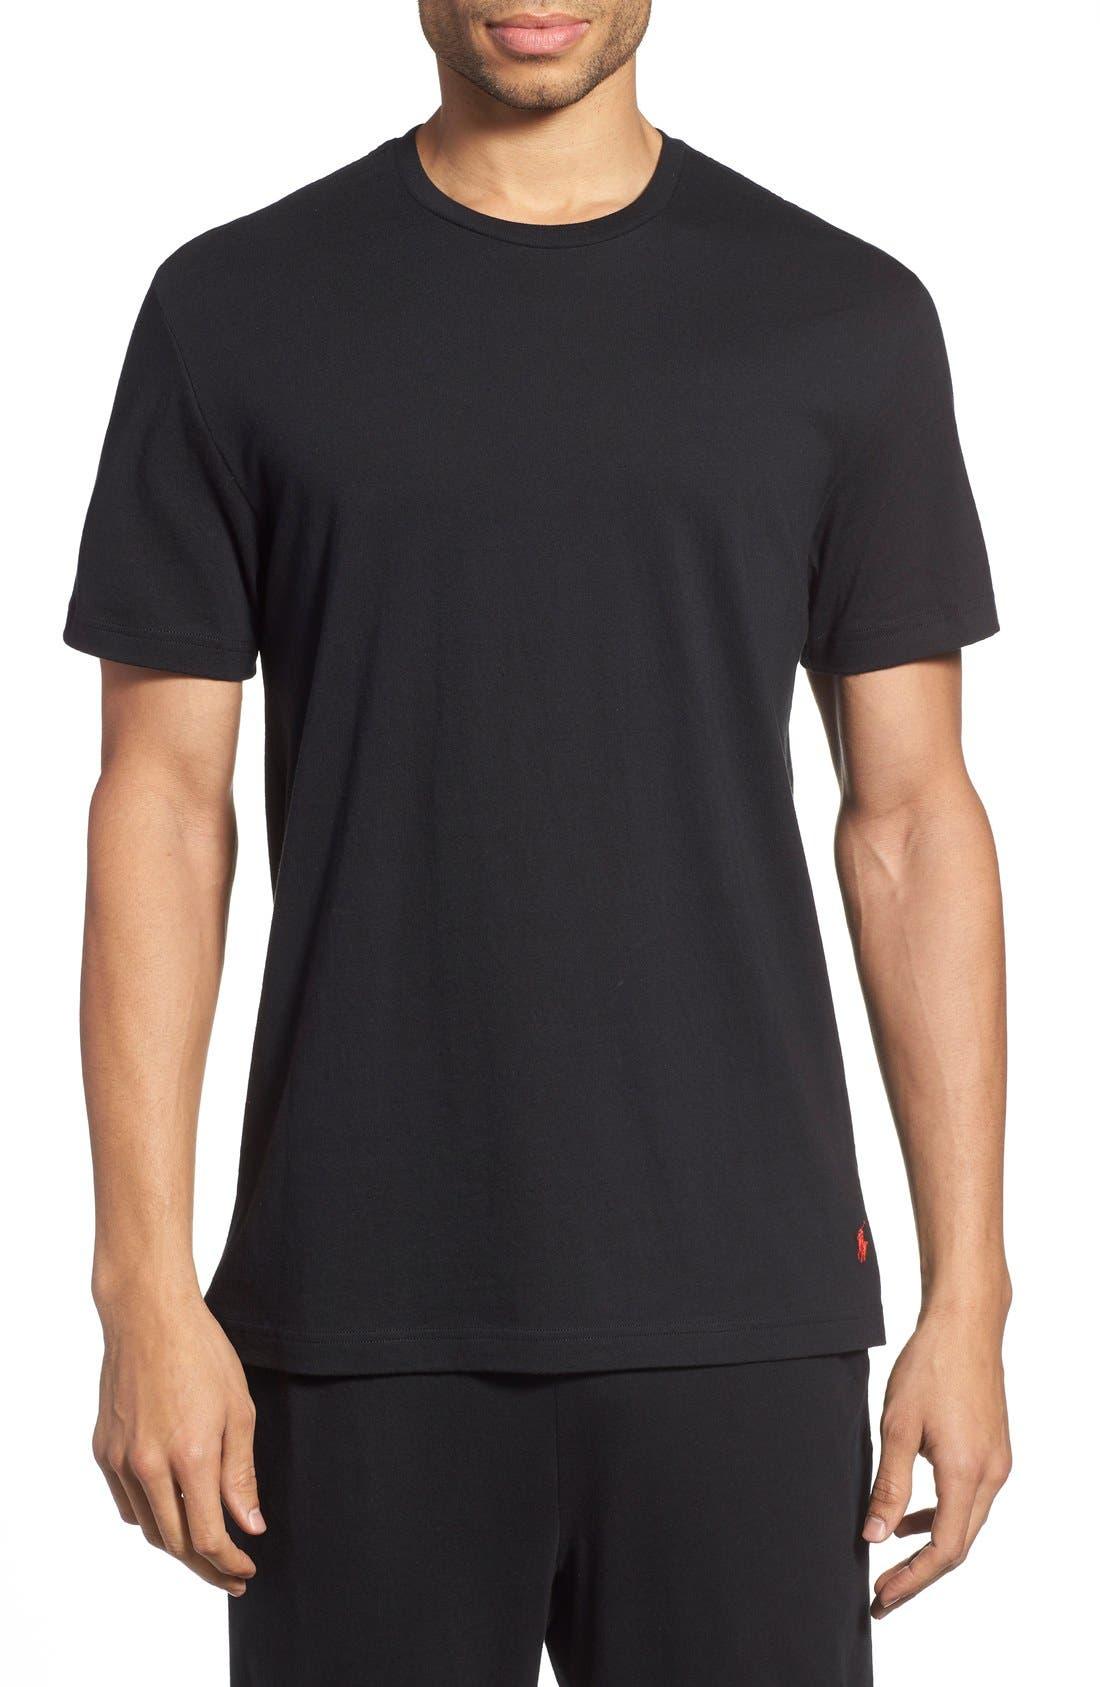 Main Image - Polo Ralph Lauren Crewneck T-Shirt